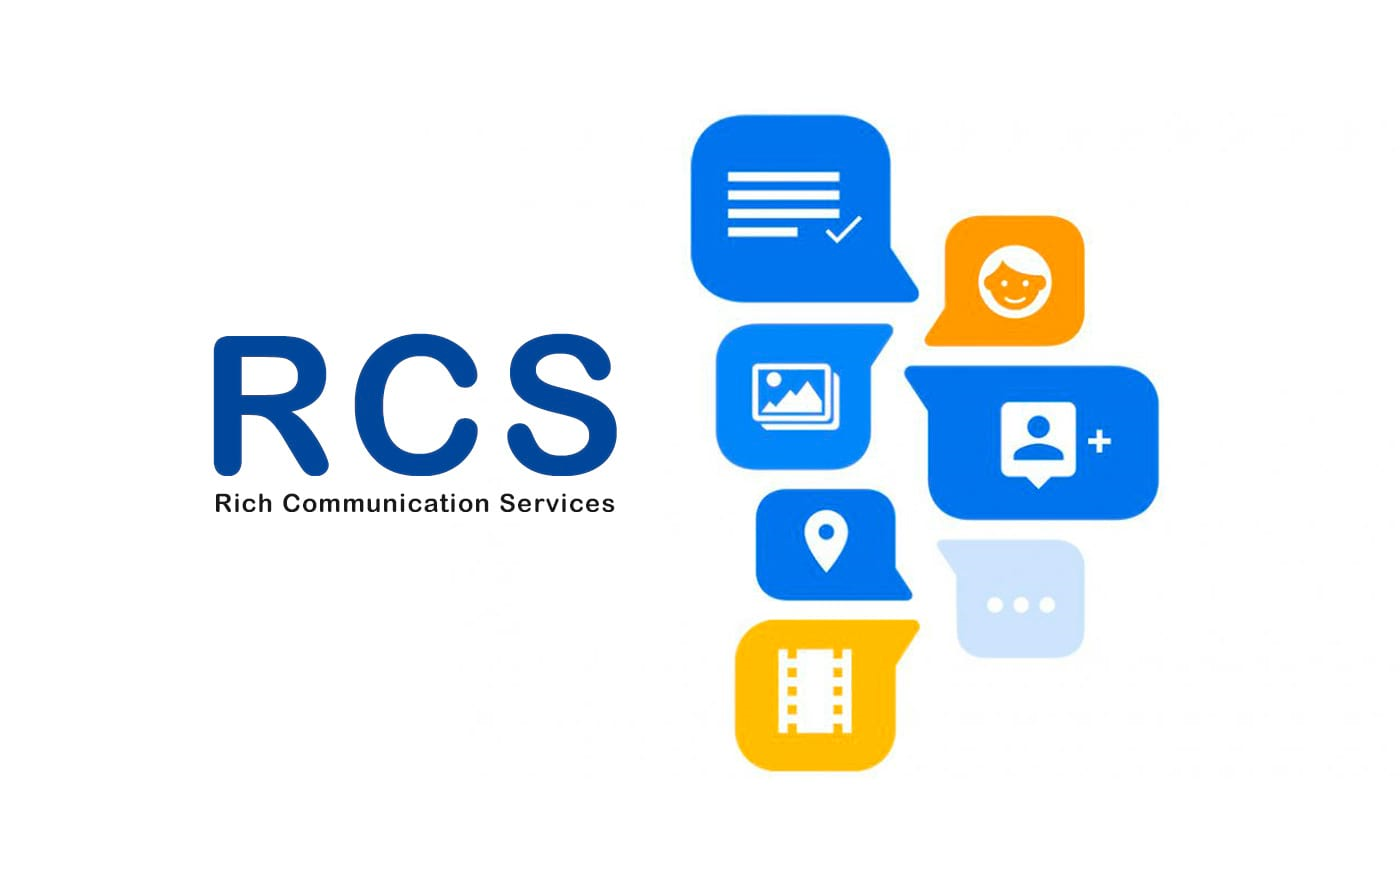 RCS پیامک گوگل اساماس SMS